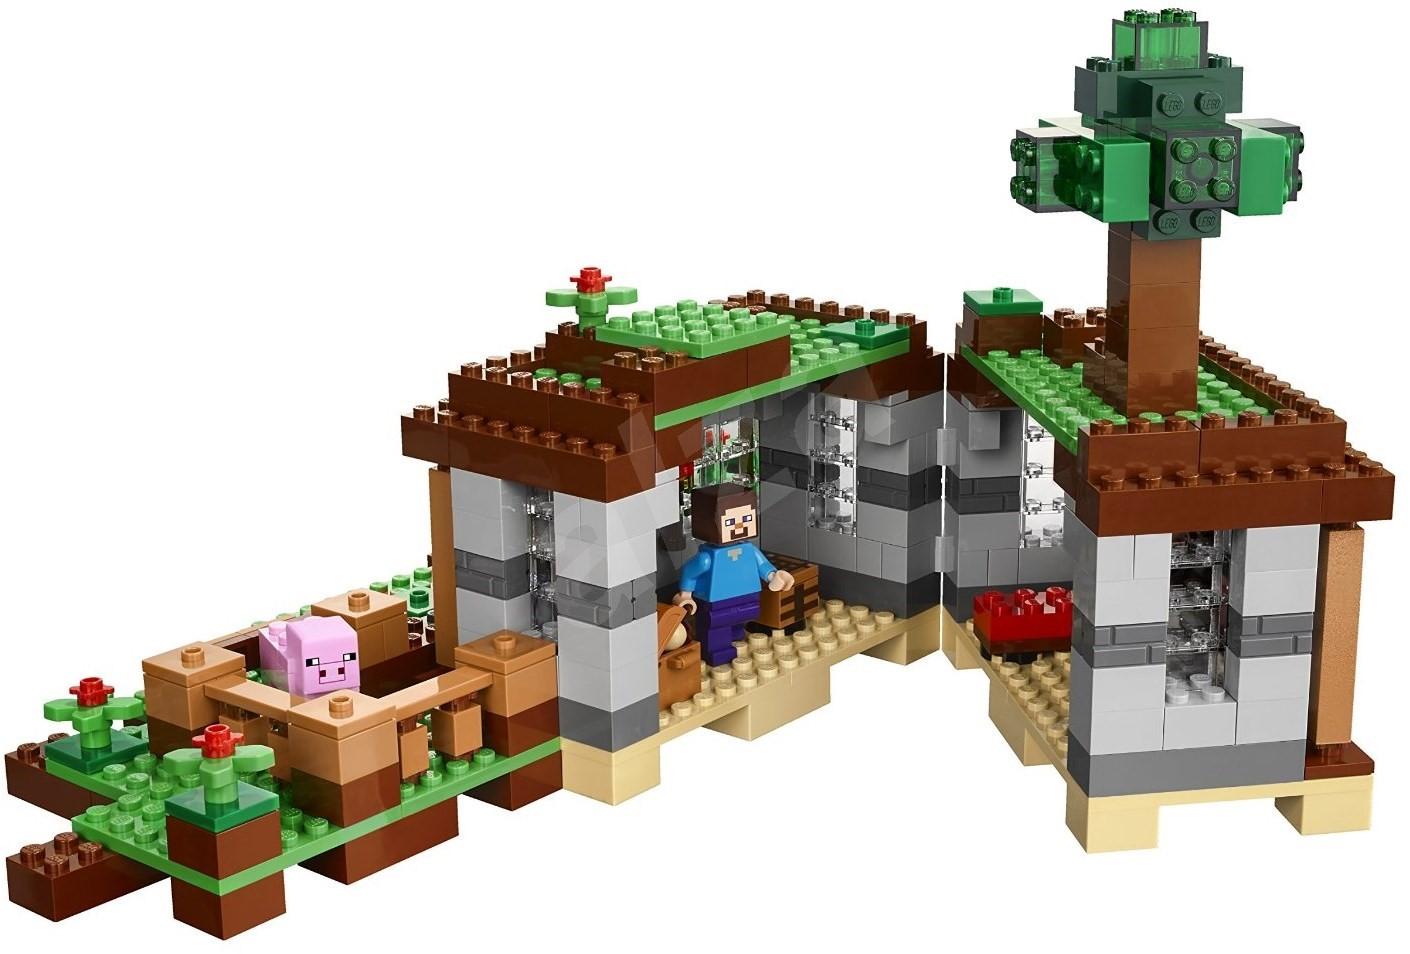 lego minecraft 21115 steves haus baukasten. Black Bedroom Furniture Sets. Home Design Ideas